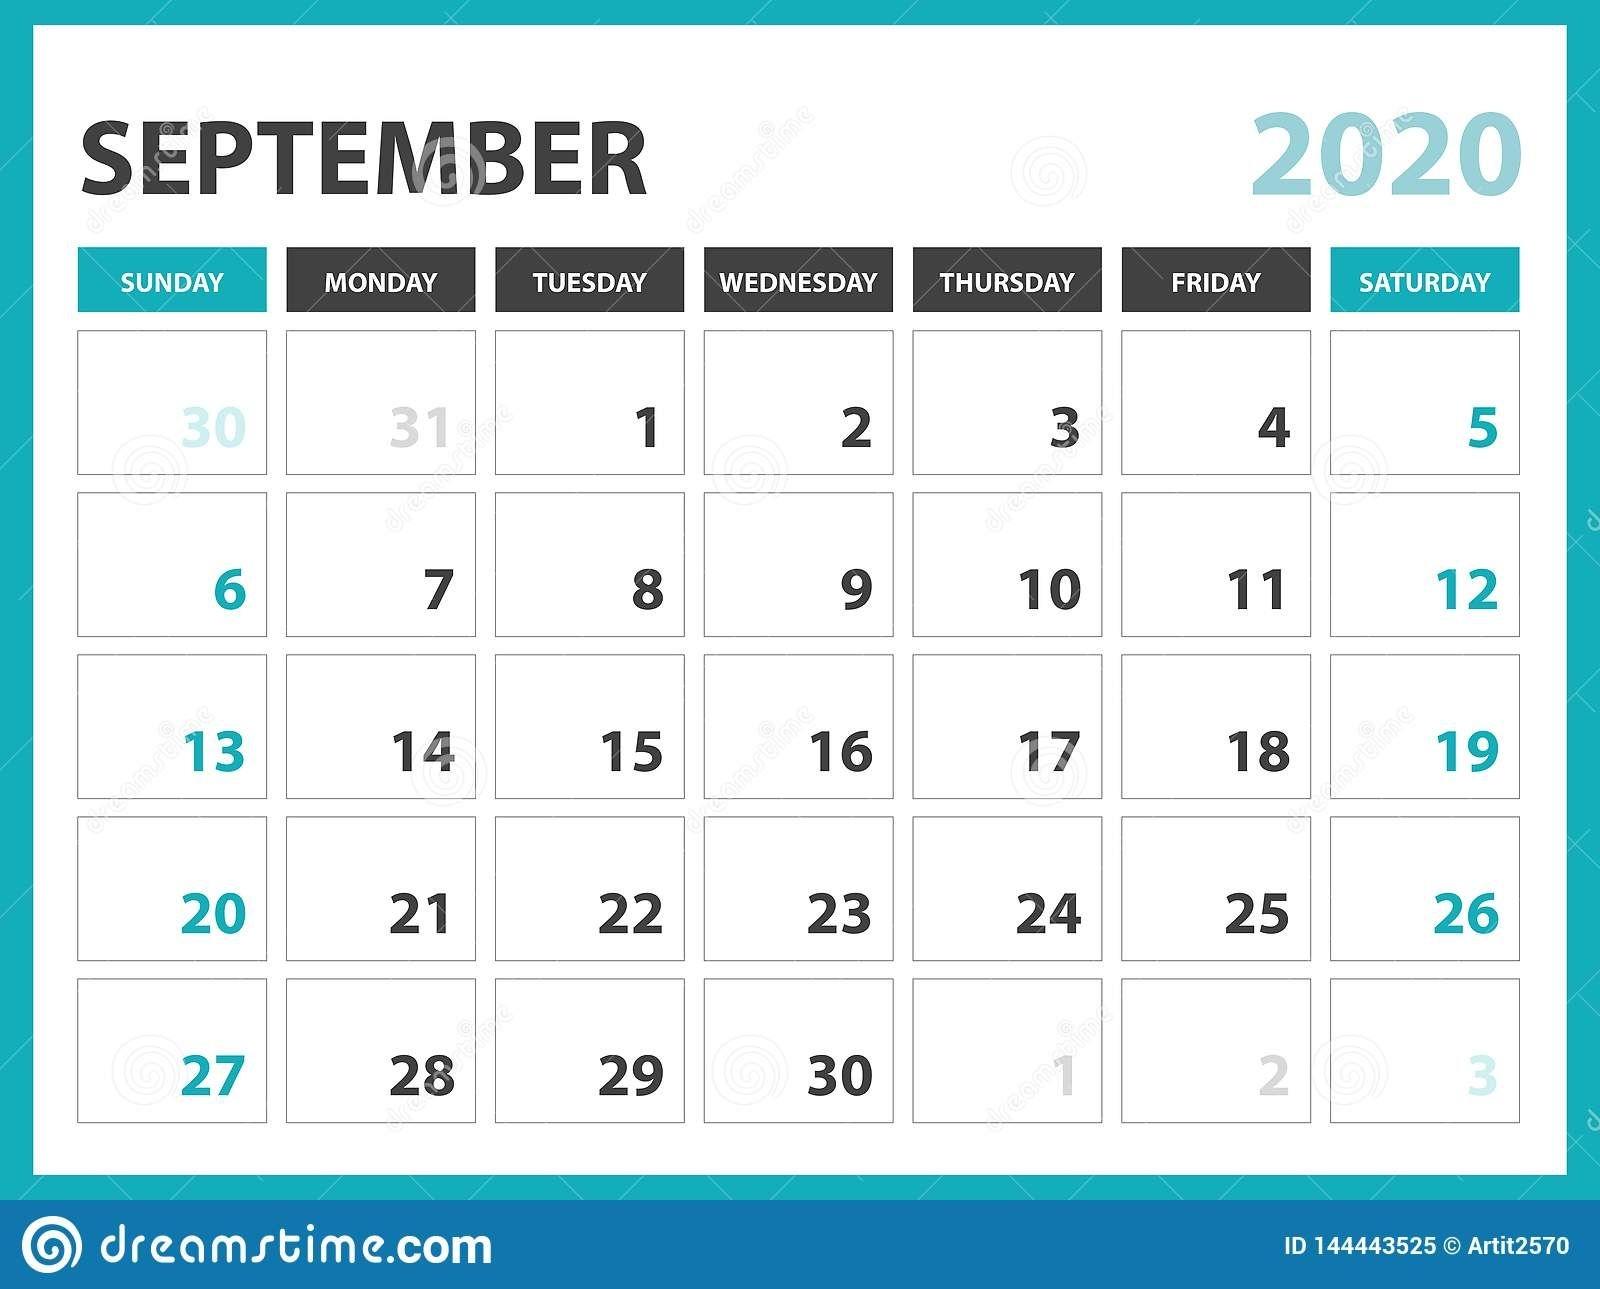 desk calendar layout size 8 x 6 inch, september 2020